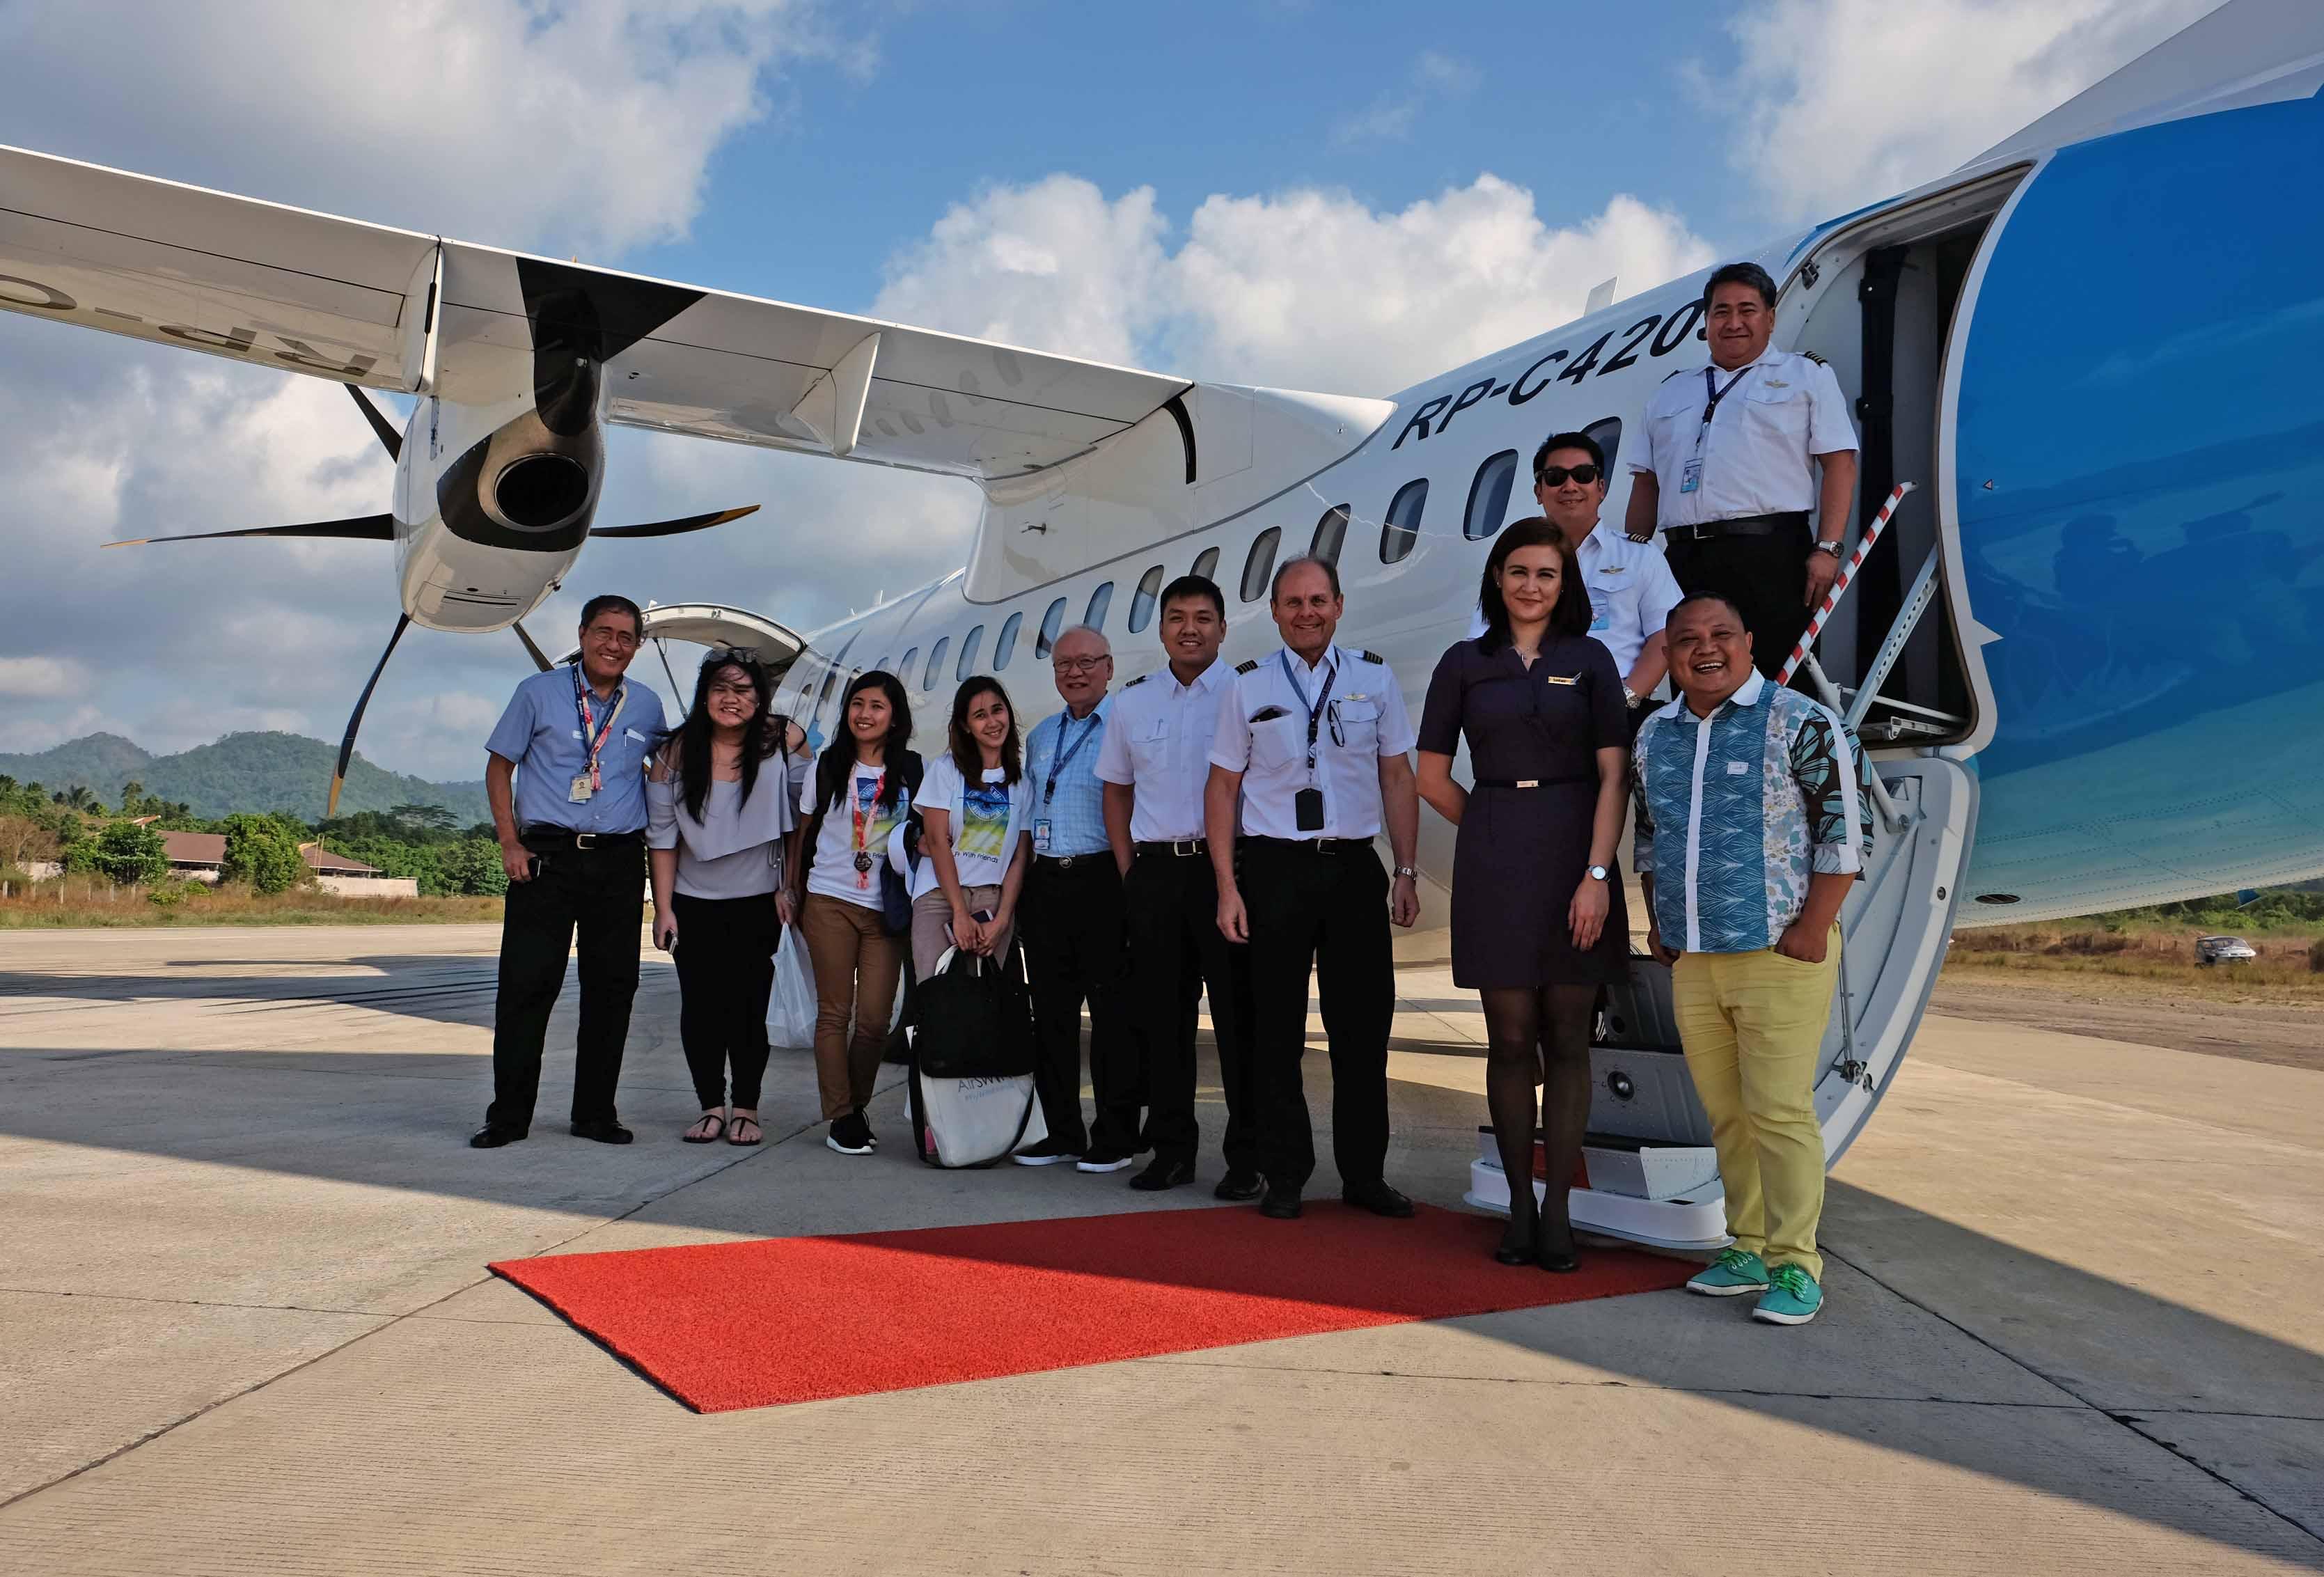 Inaugural passengers u0026 flight crew at Lio Airport, El Nido.